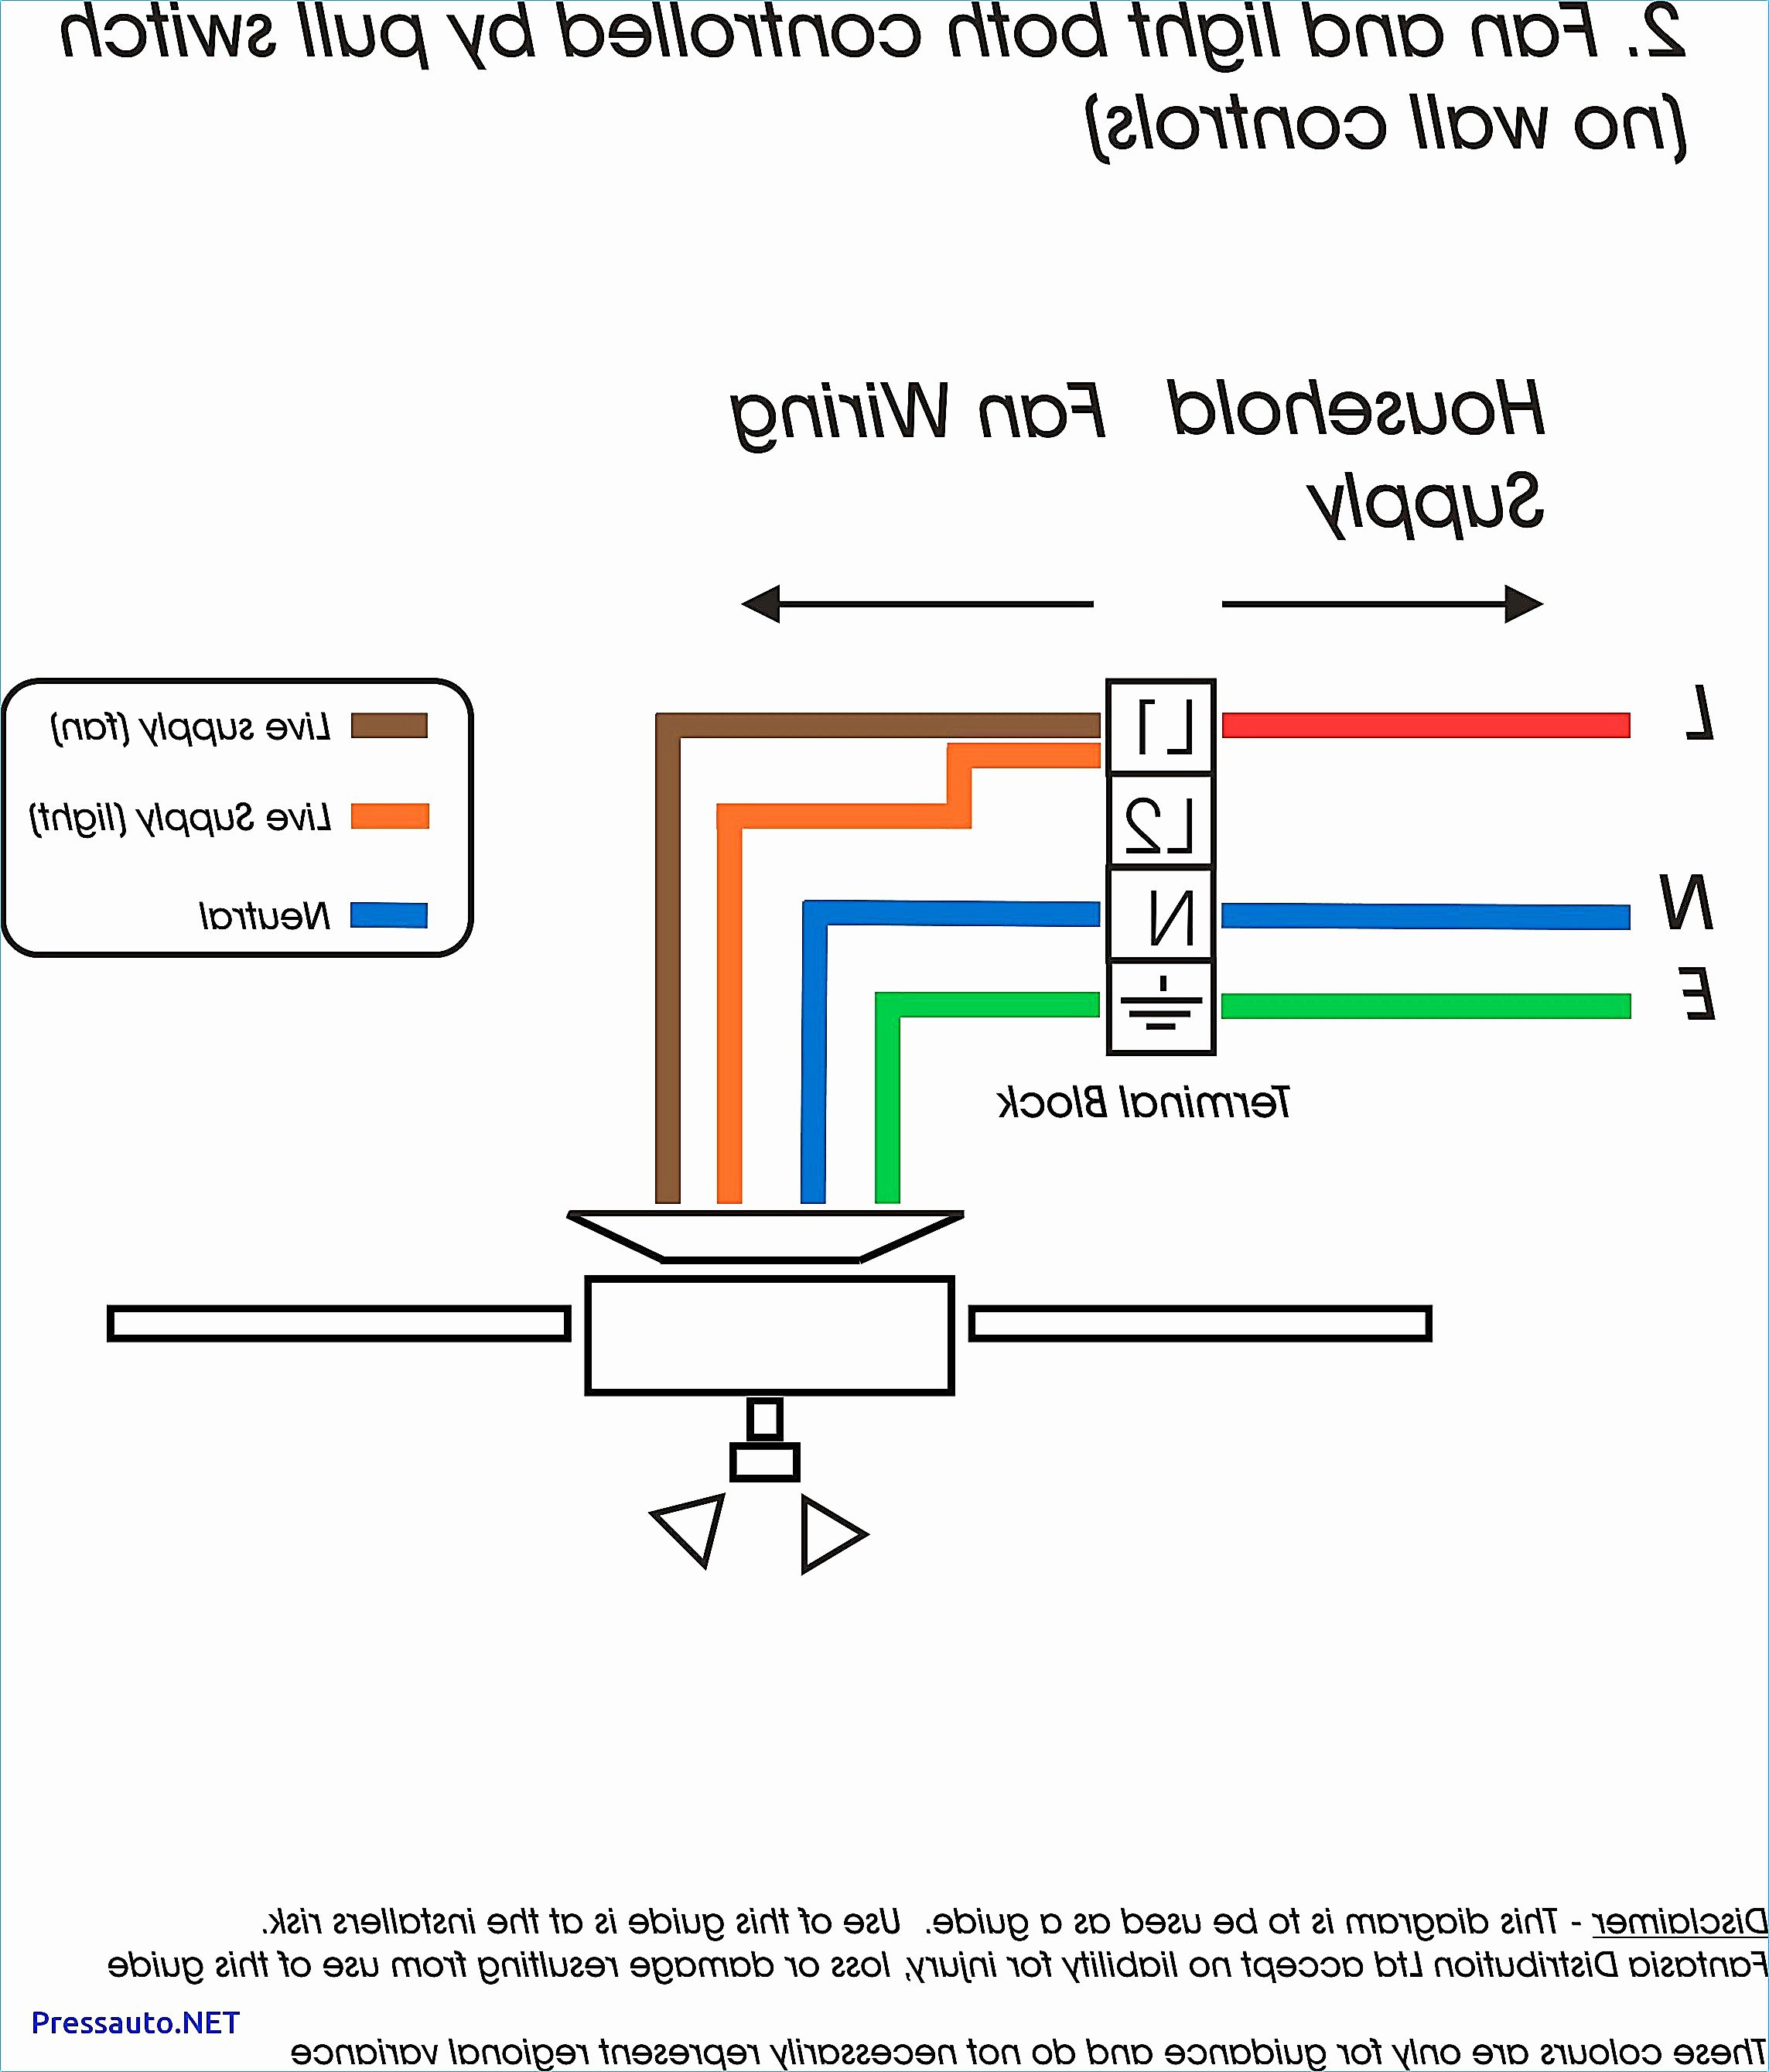 Chevy Tow Mirror Wiring Diagram | Wiring Diagram - Chevy Tow Mirror Wiring Diagram